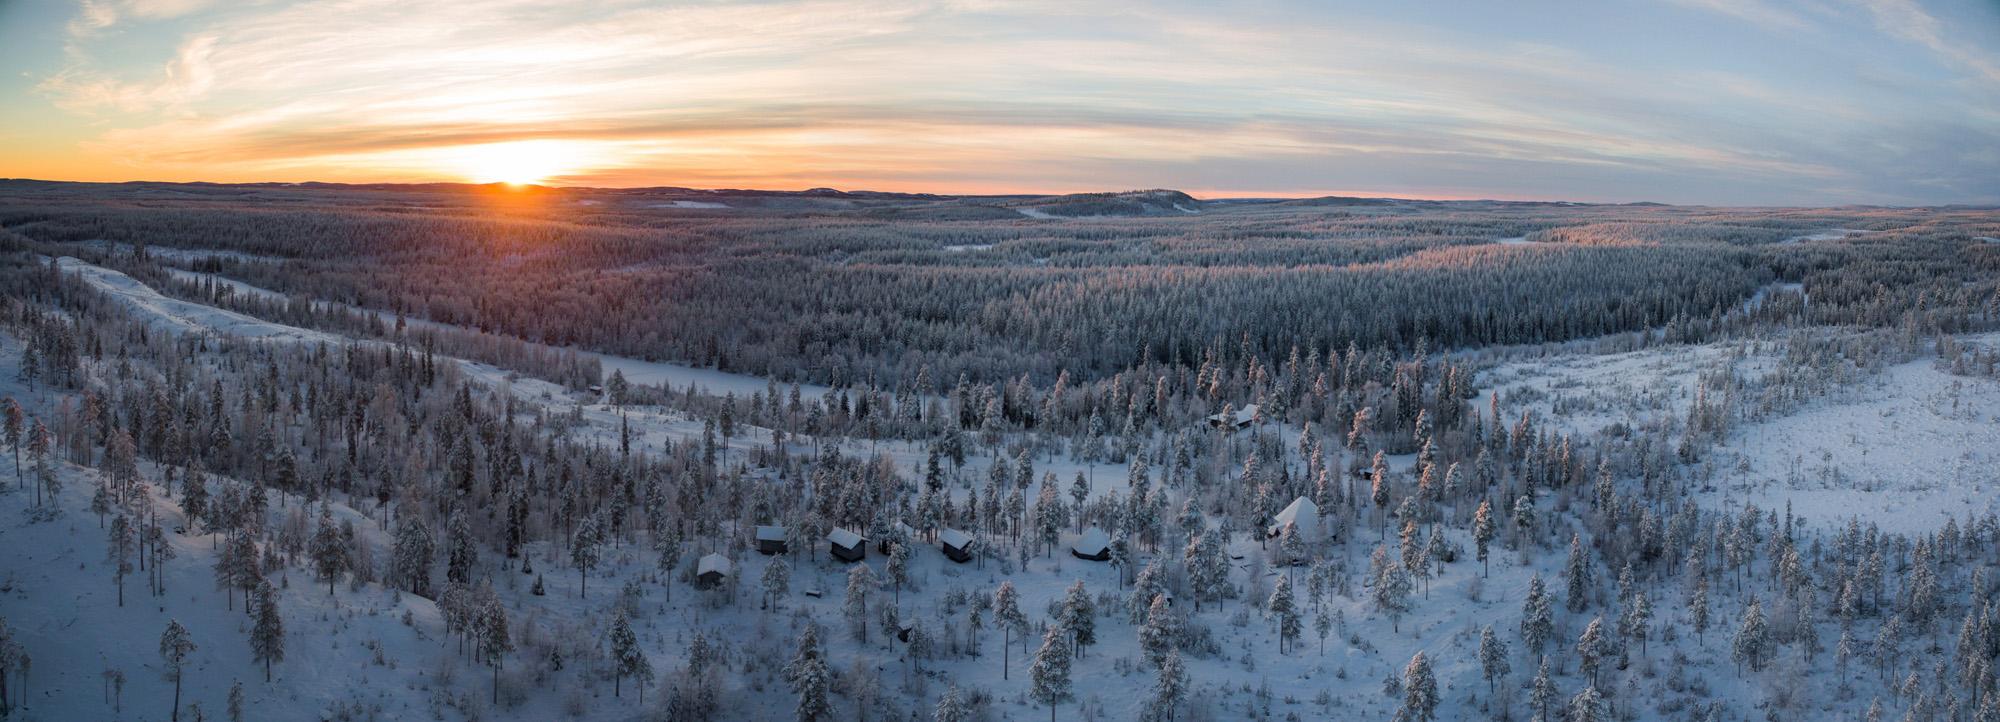 Svansele Wilderness Camp Winter aerial 01